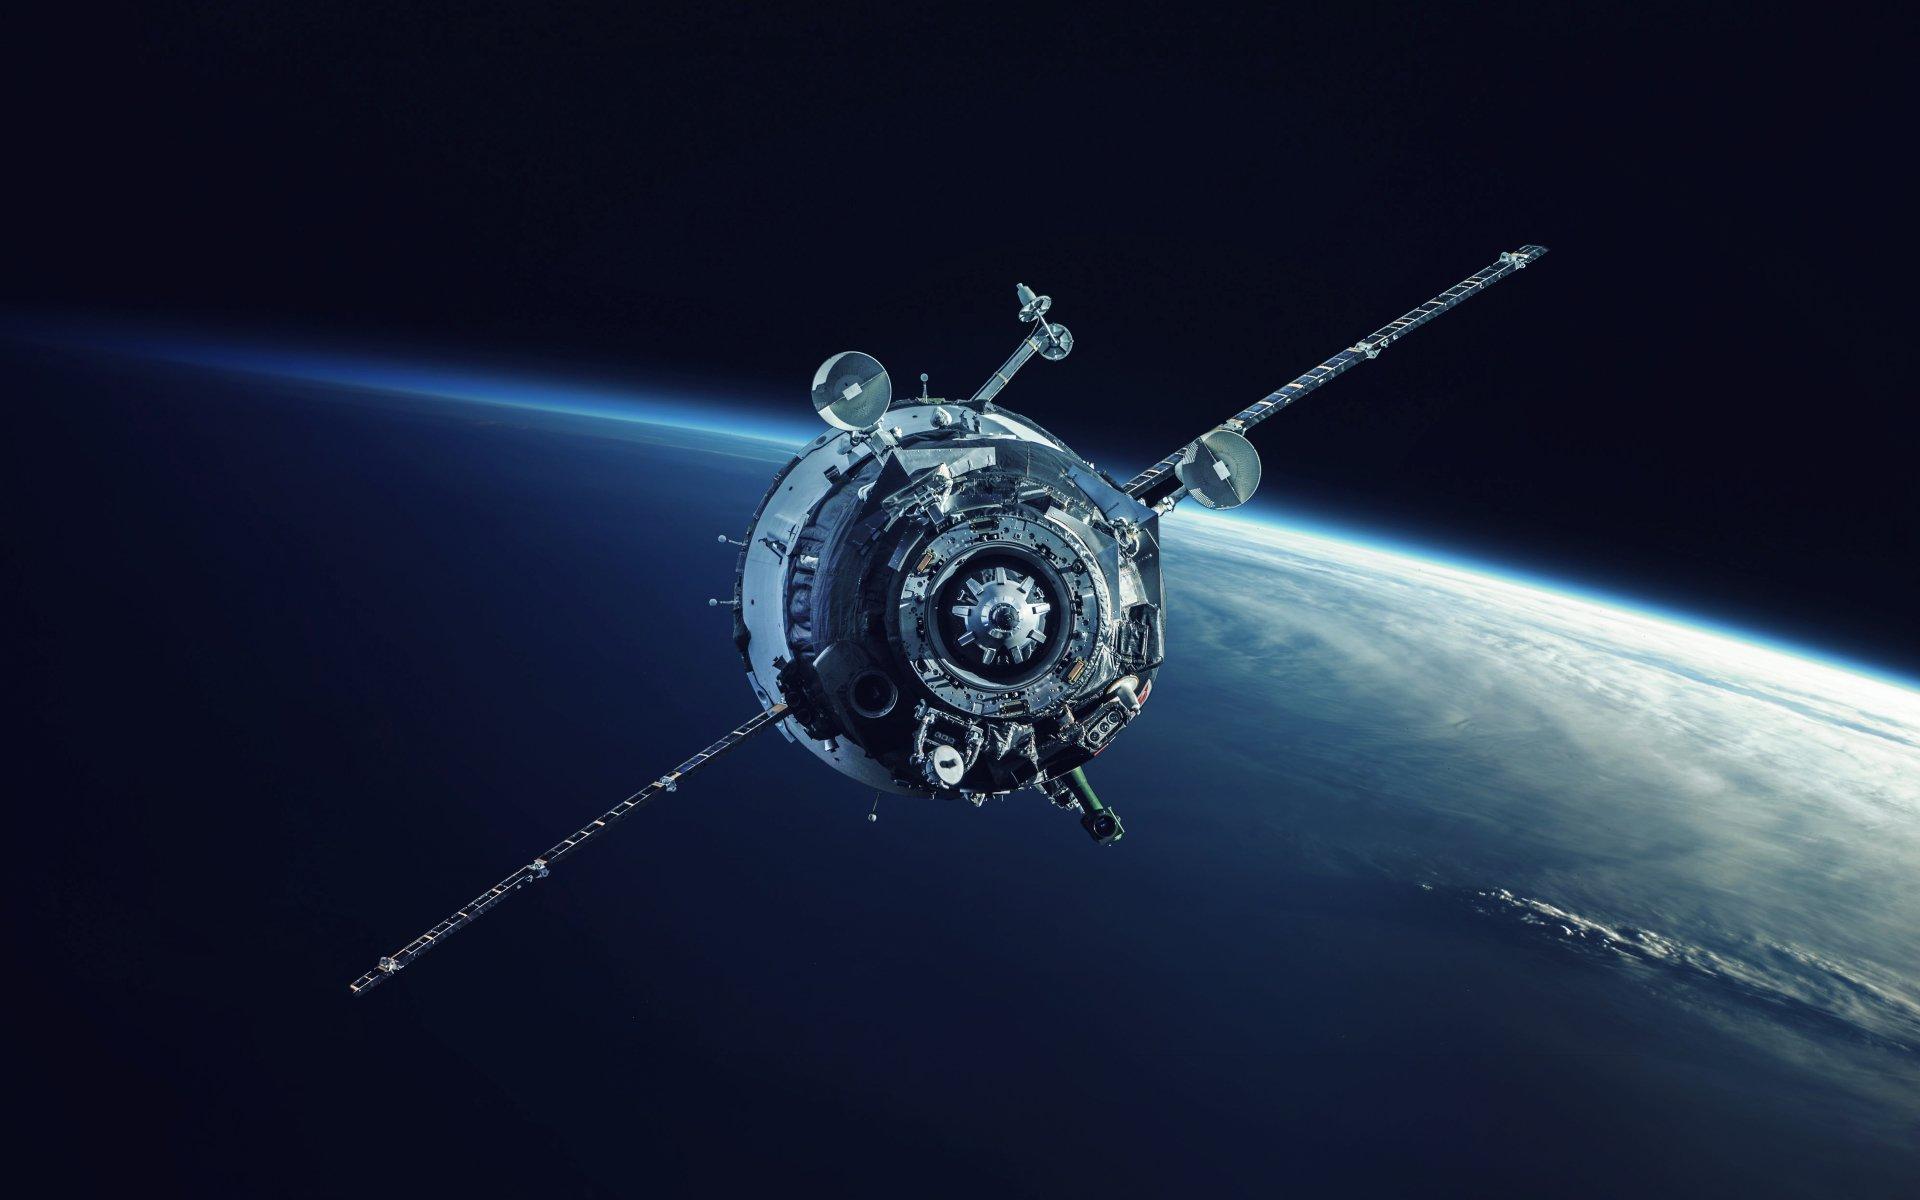 Satellite 5k retina ultra hd wallpaper background image 5200x3250 id 807186 wallpaper abyss - Satellite wallpaper hd ...